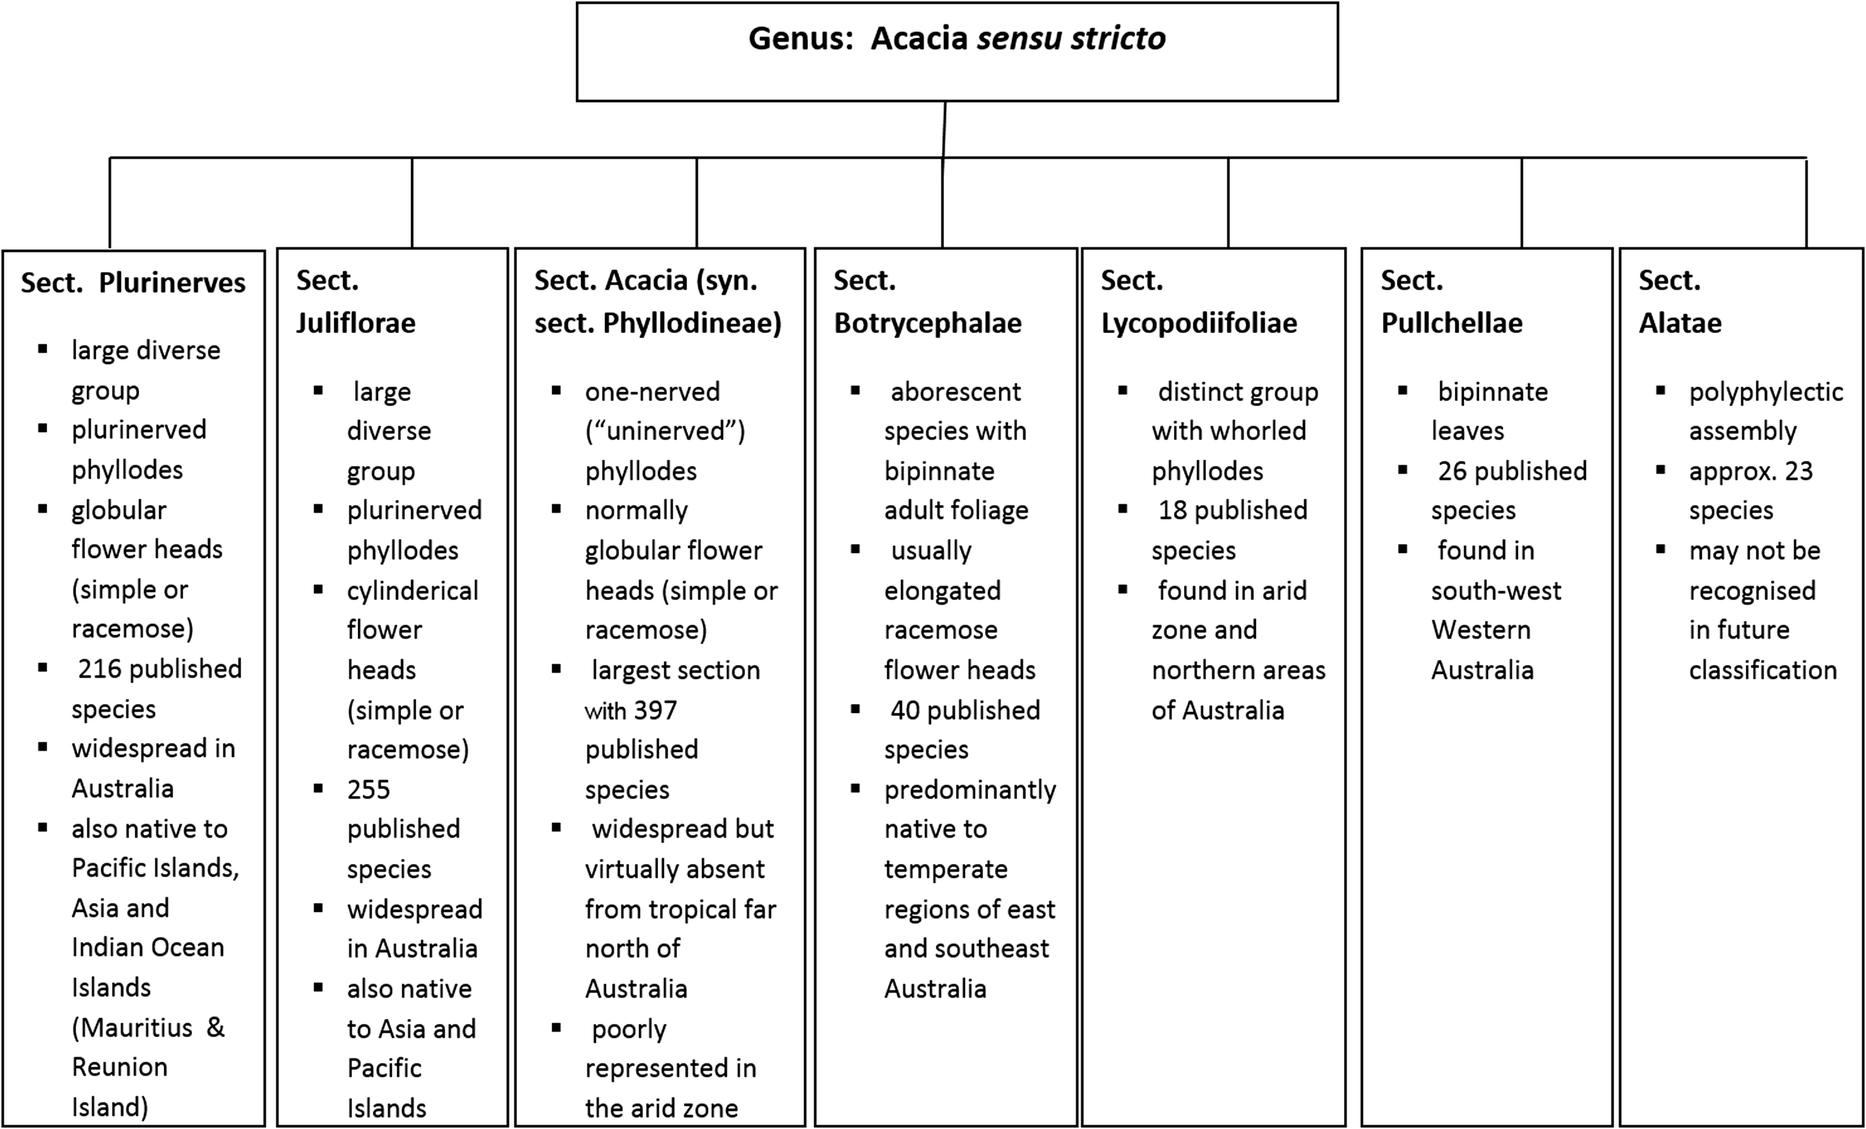 Phytochemistry and bioactivity of Acacia sensu stricto